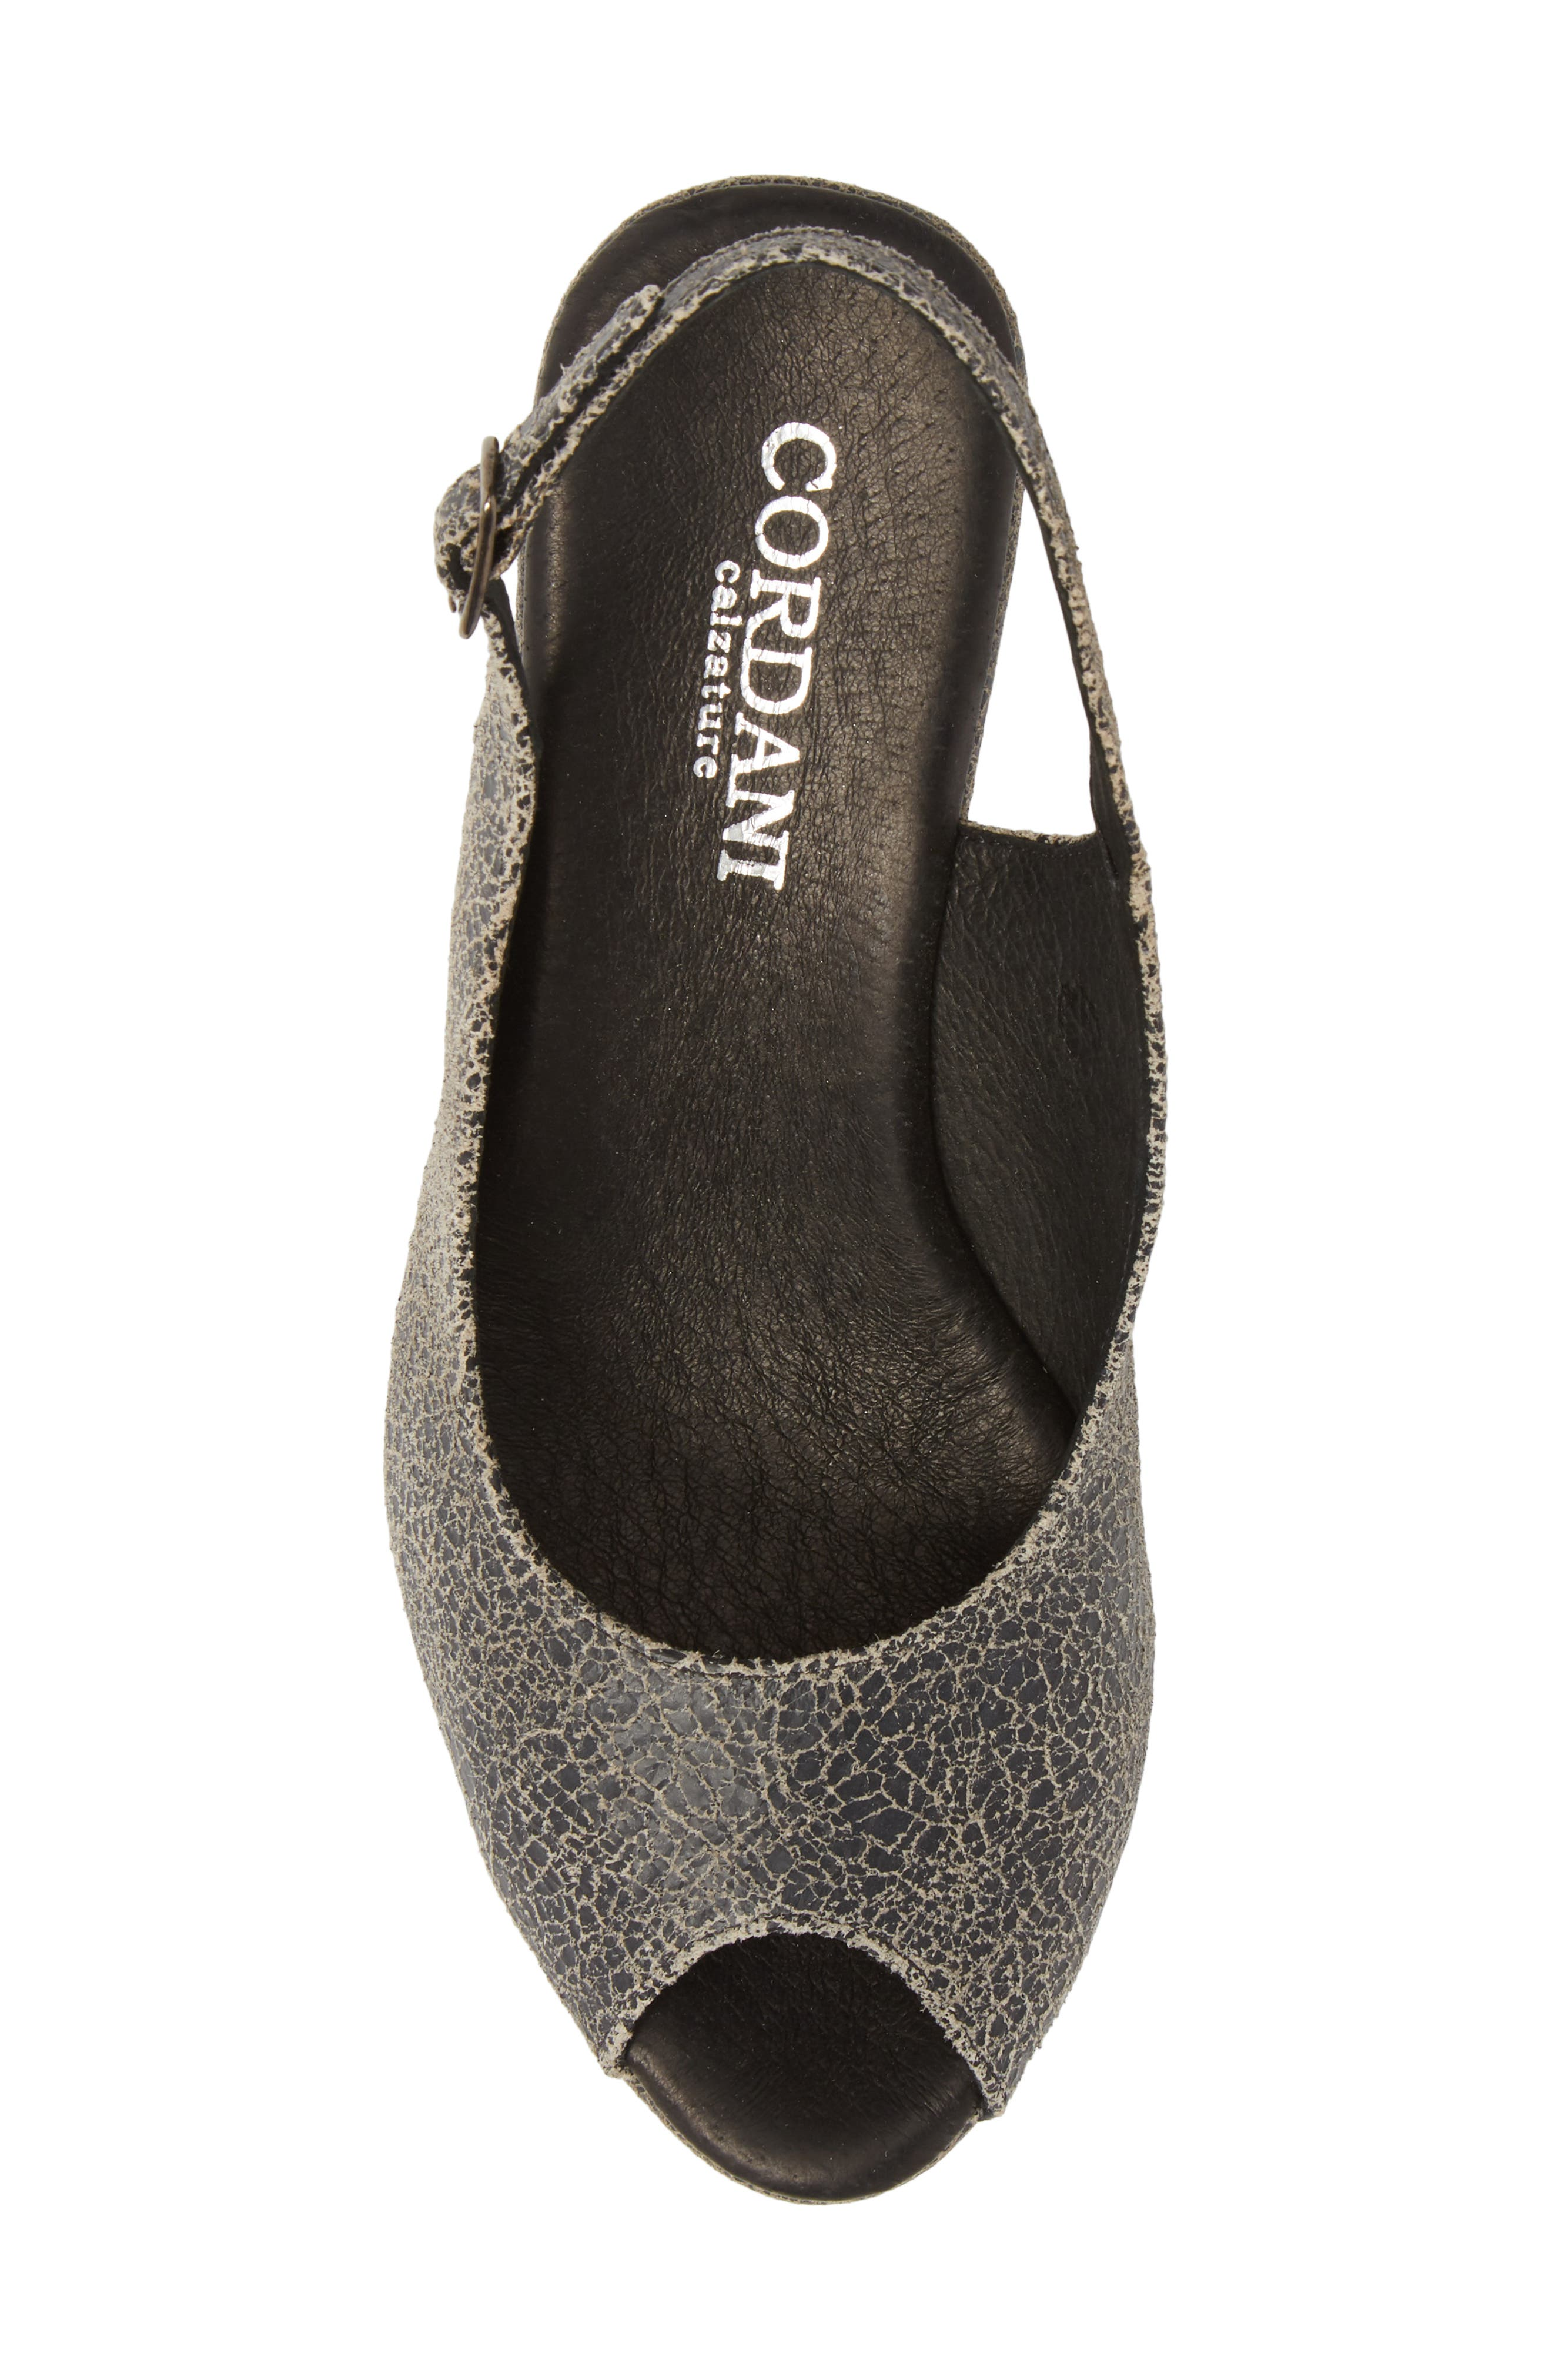 Fabrice Slingback Platform Sandal,                             Alternate thumbnail 5, color,                             Grey Crackle Leather